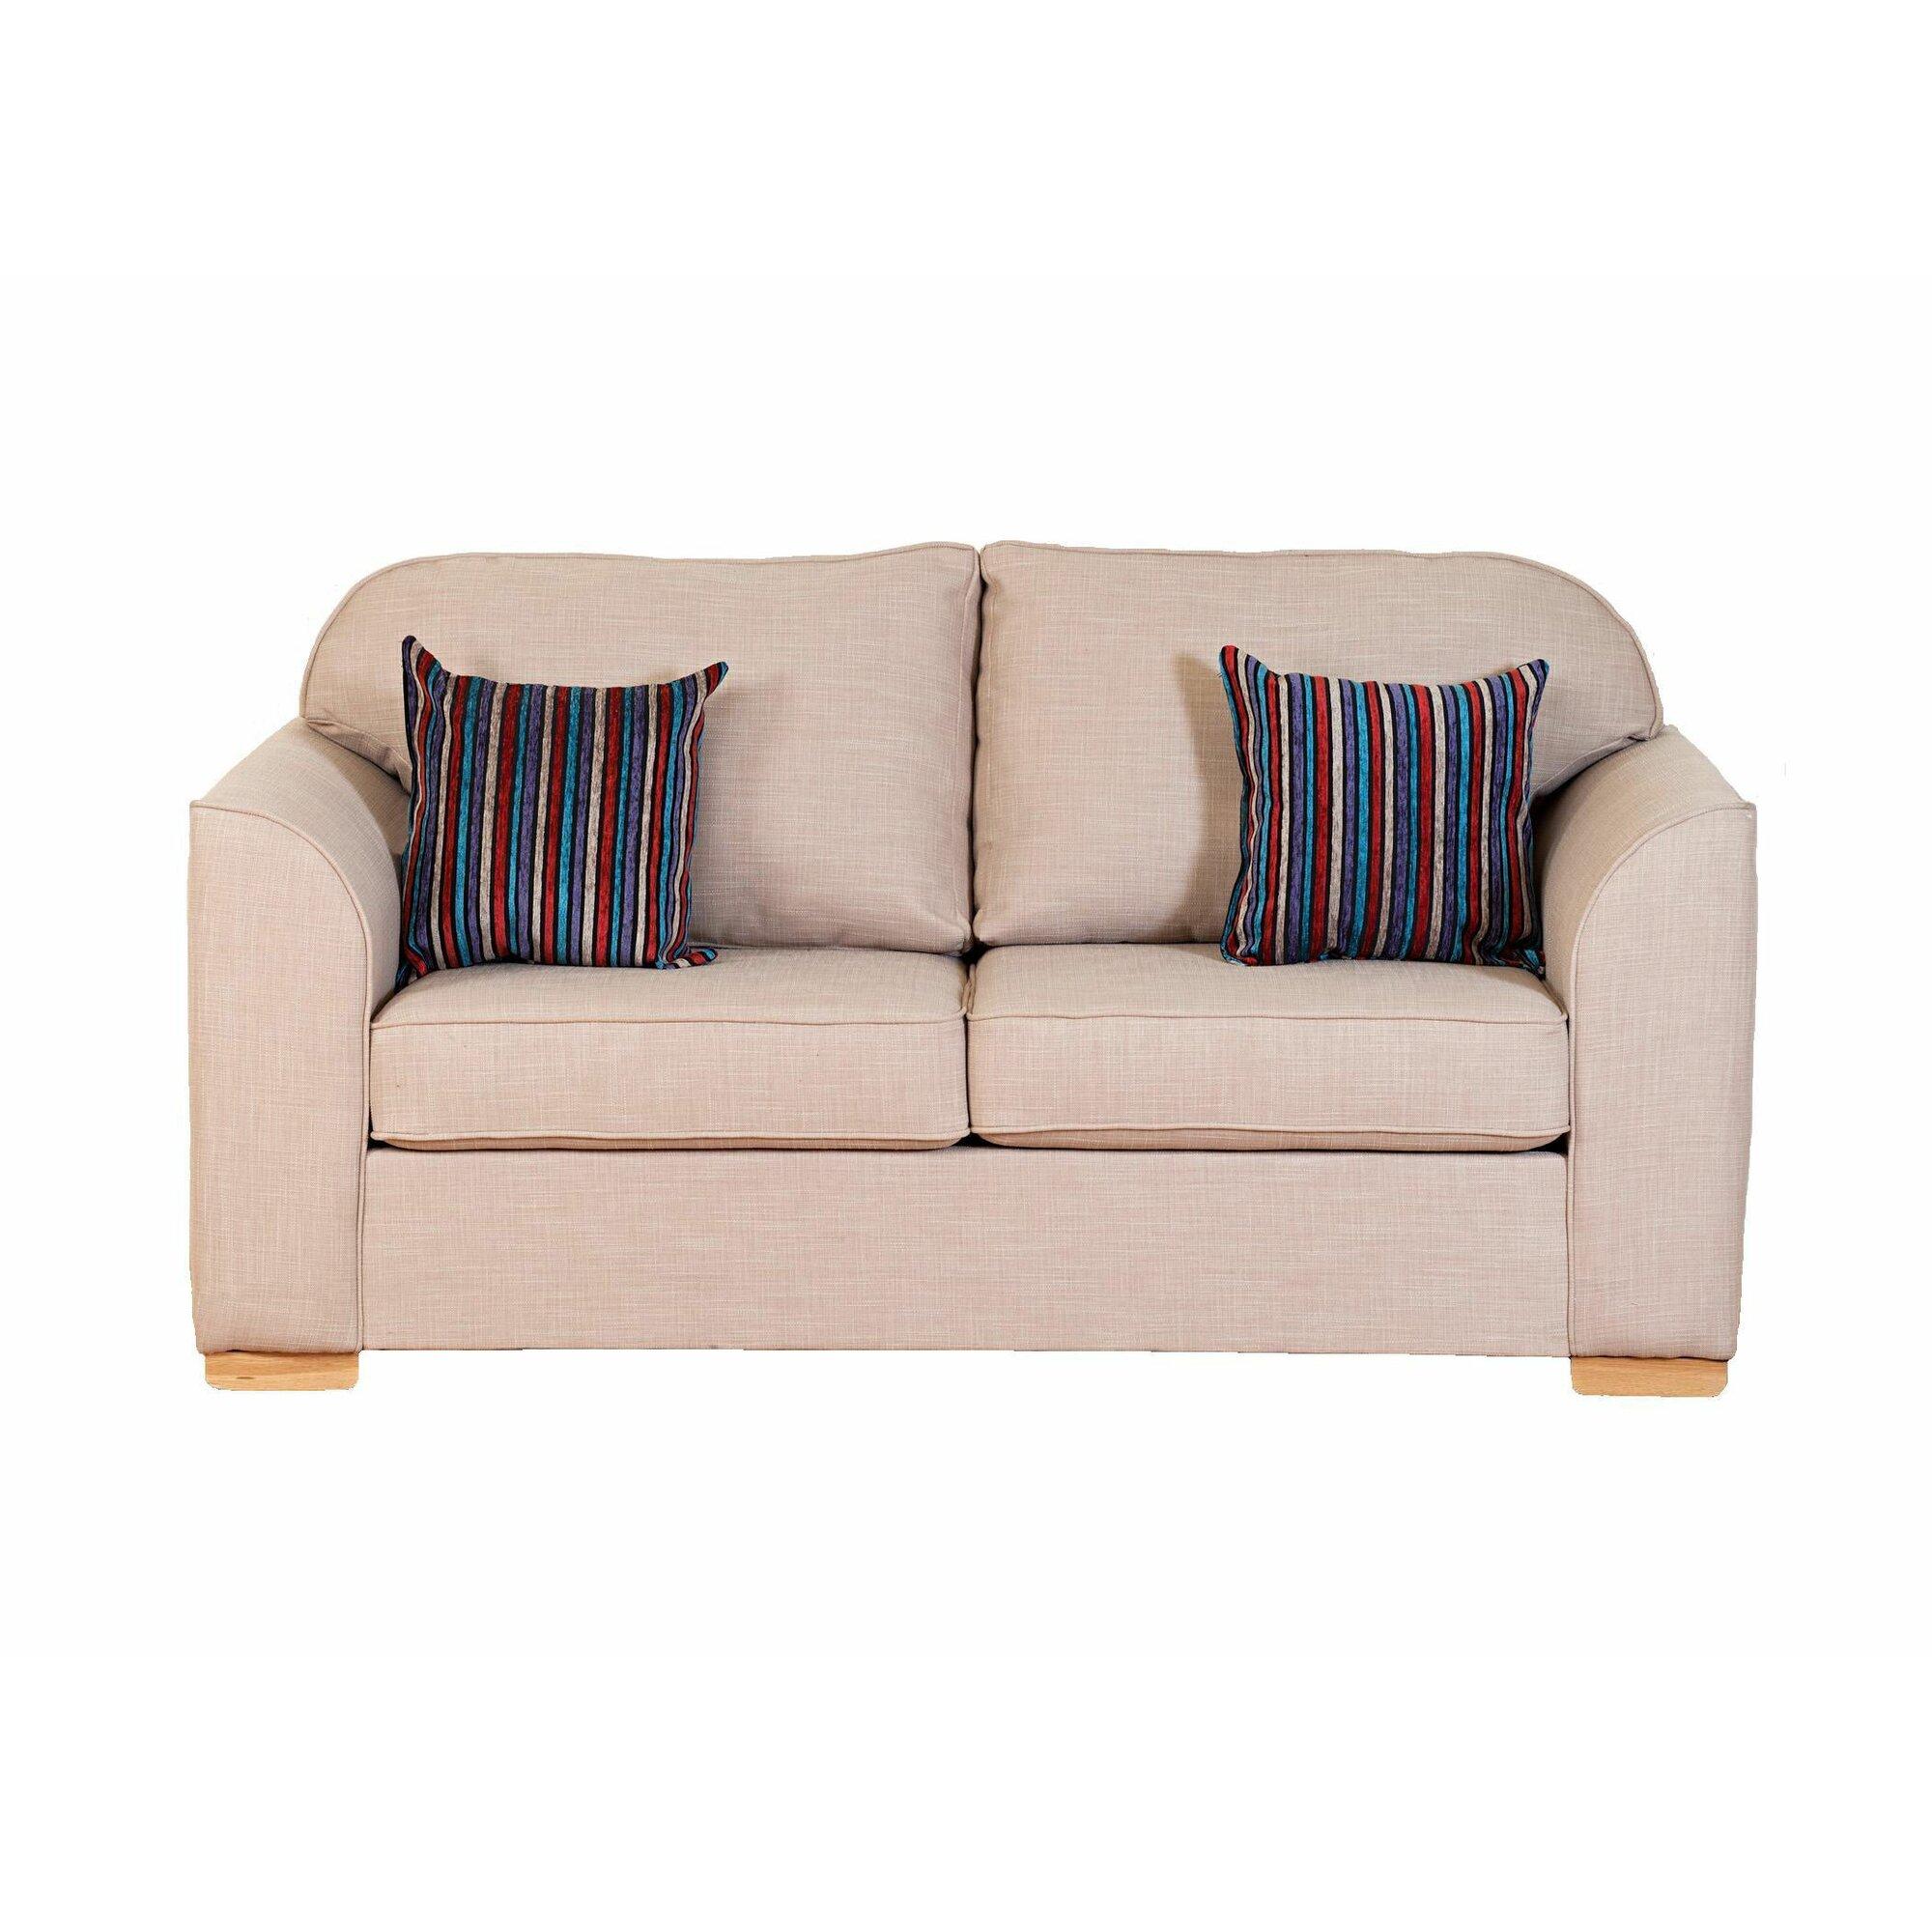 kyoto 2 sitzer schlafsofa belgrave bewertungen. Black Bedroom Furniture Sets. Home Design Ideas